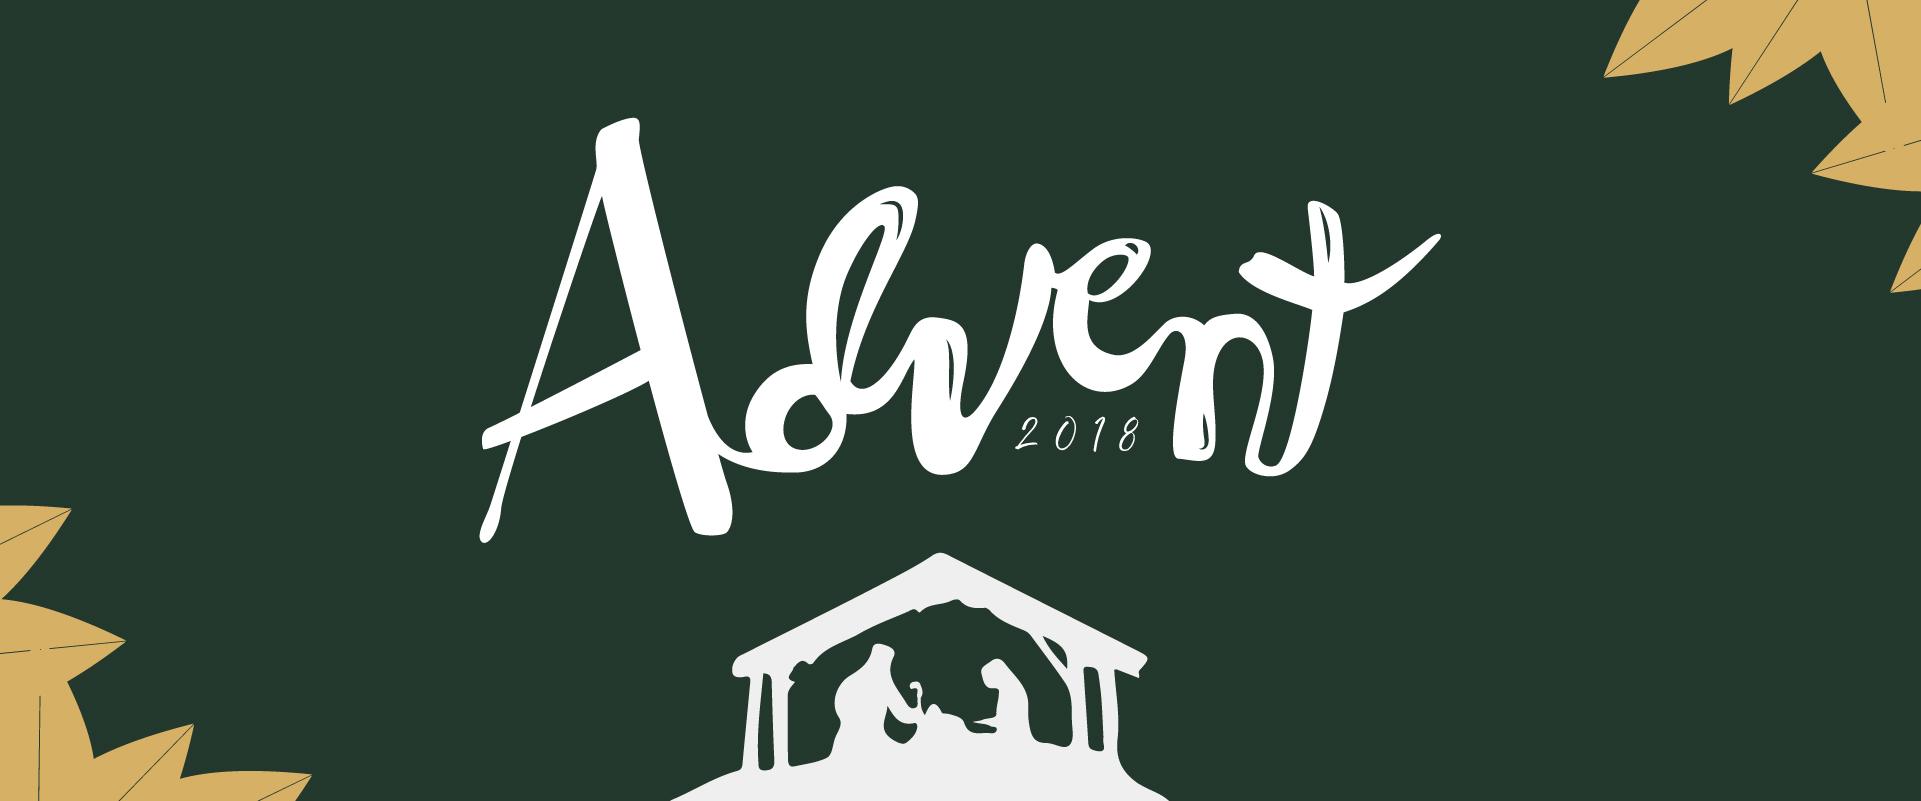 SE4_Advent-03.jpg